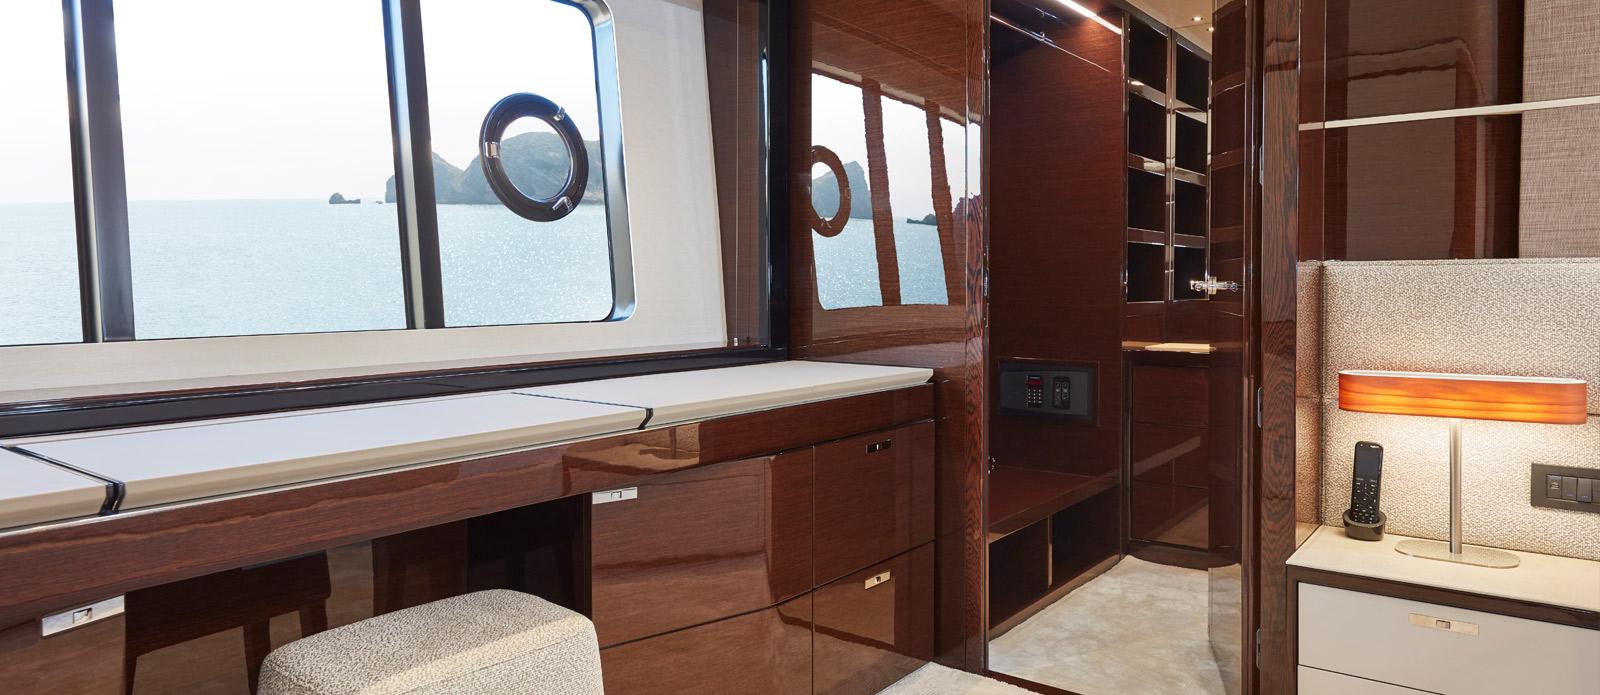 Princess 30 Metre Yacht Bandazul - VIP Vanity Area